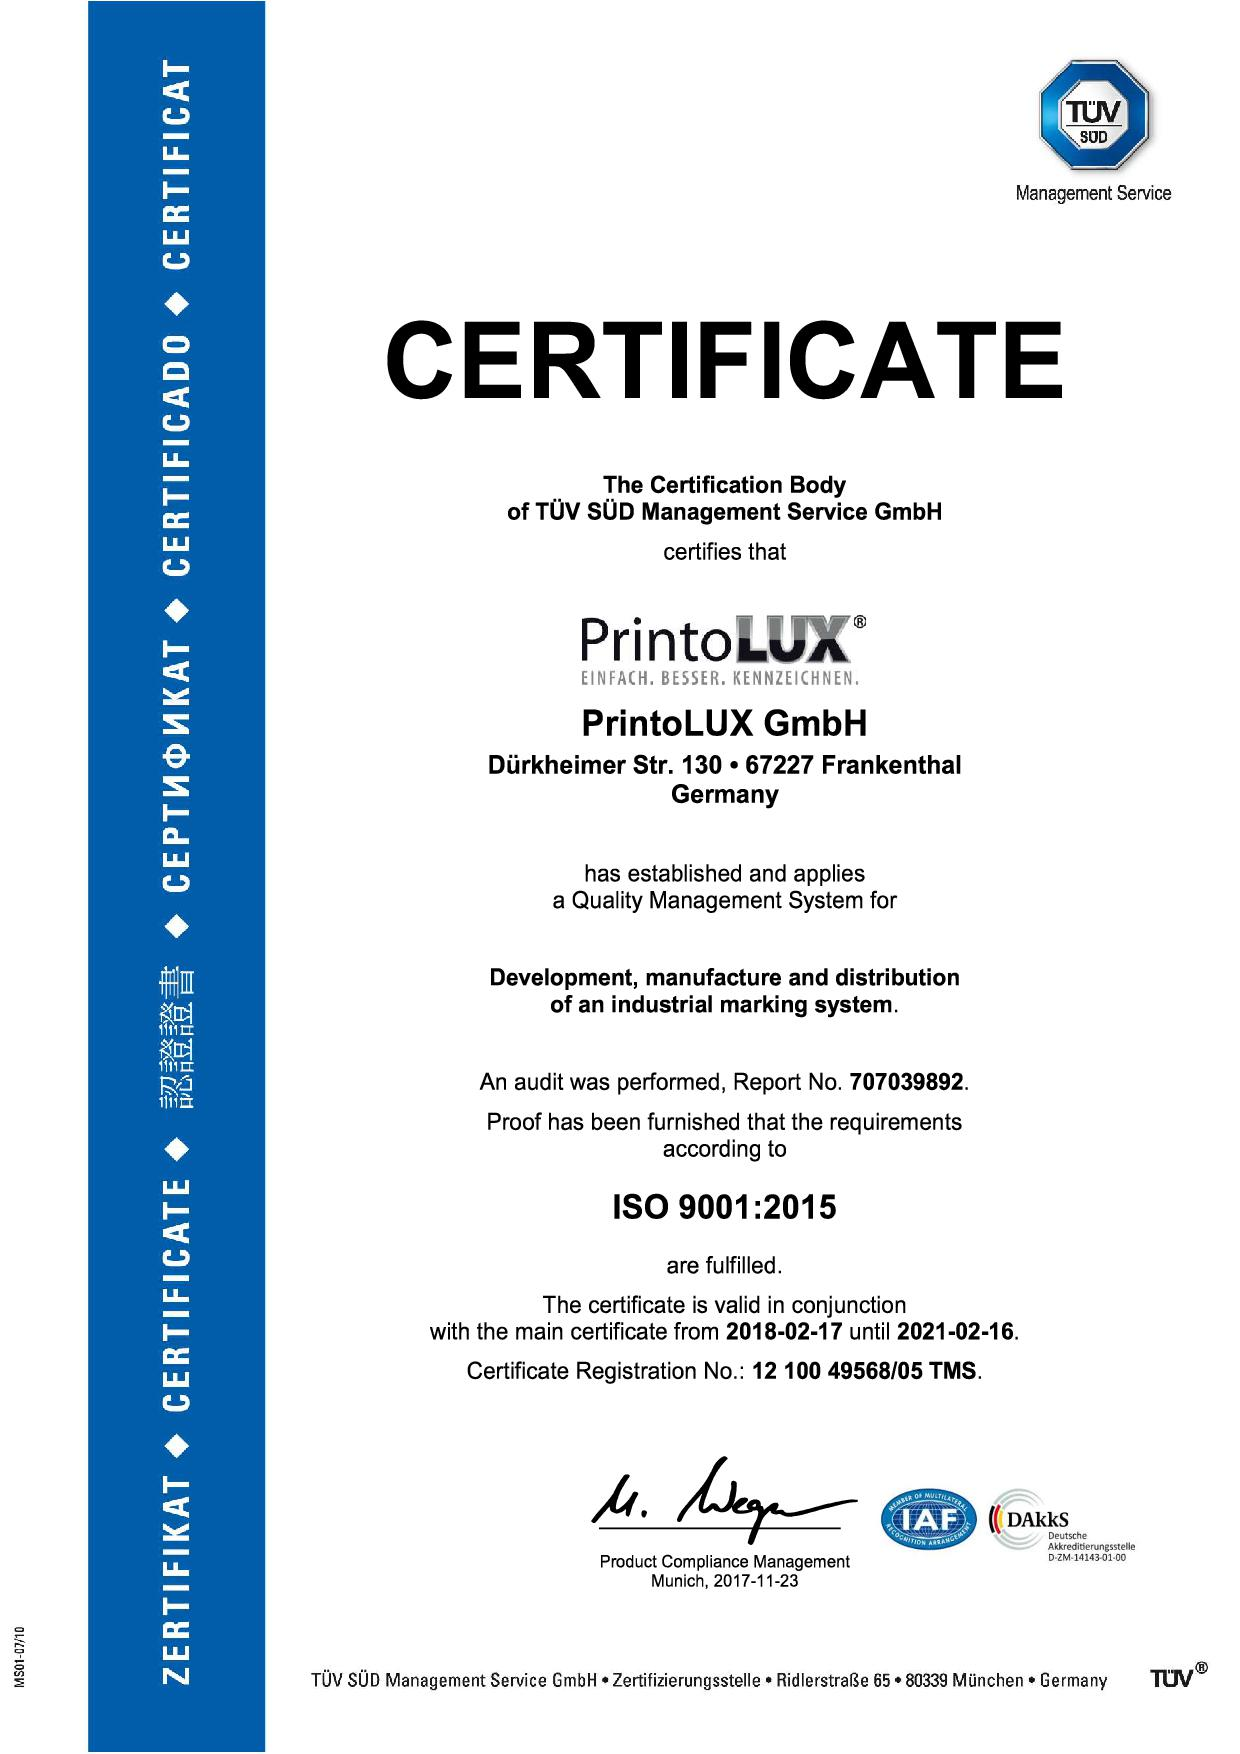 printolux-iso9001-certification